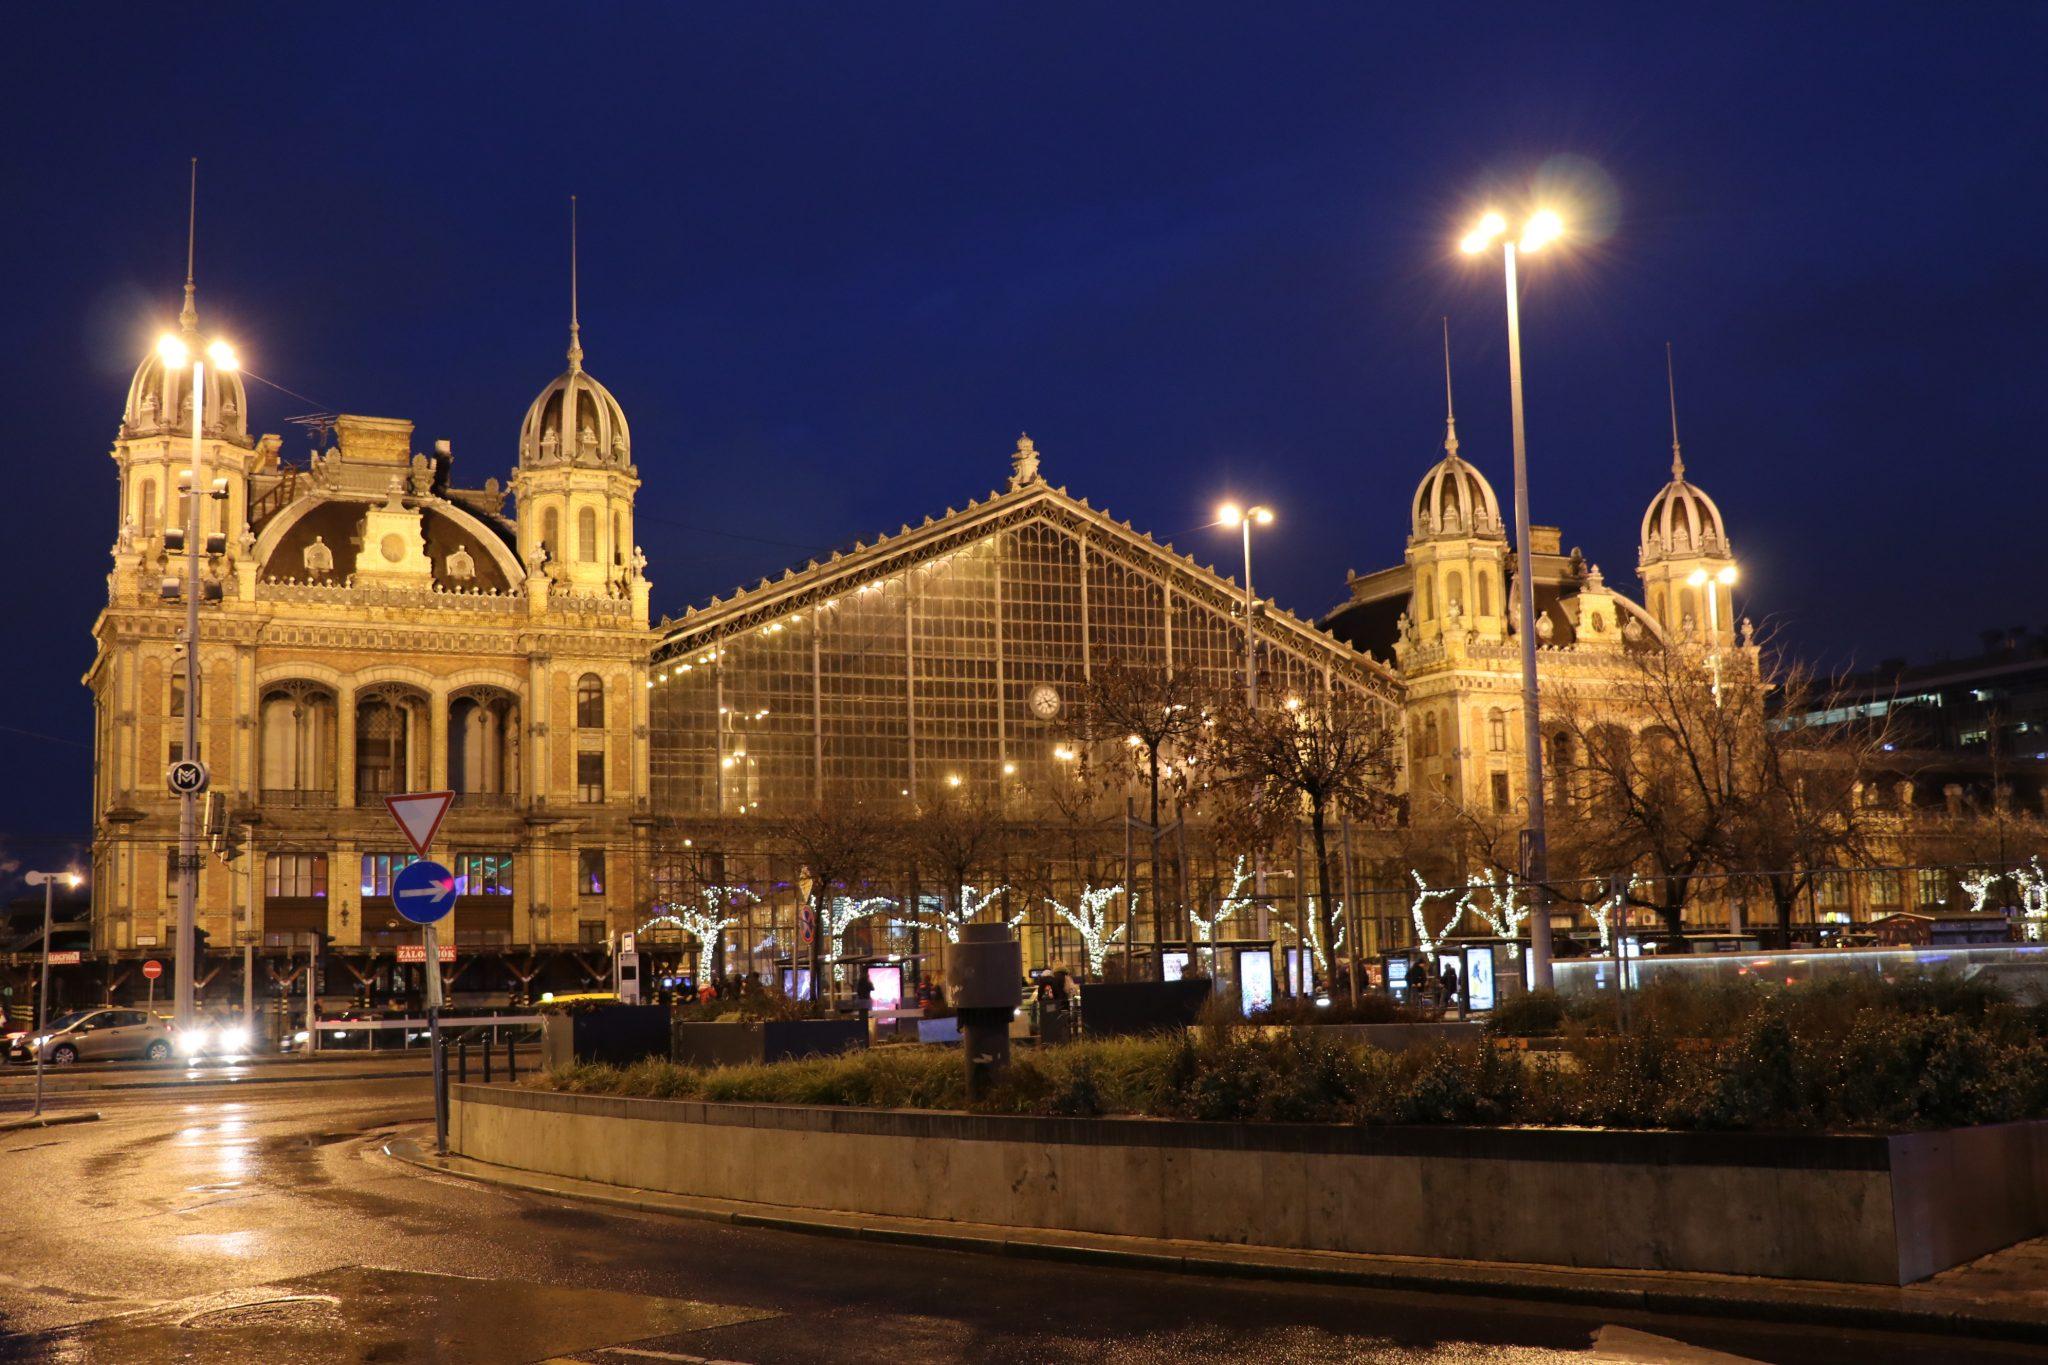 nyugati railway station